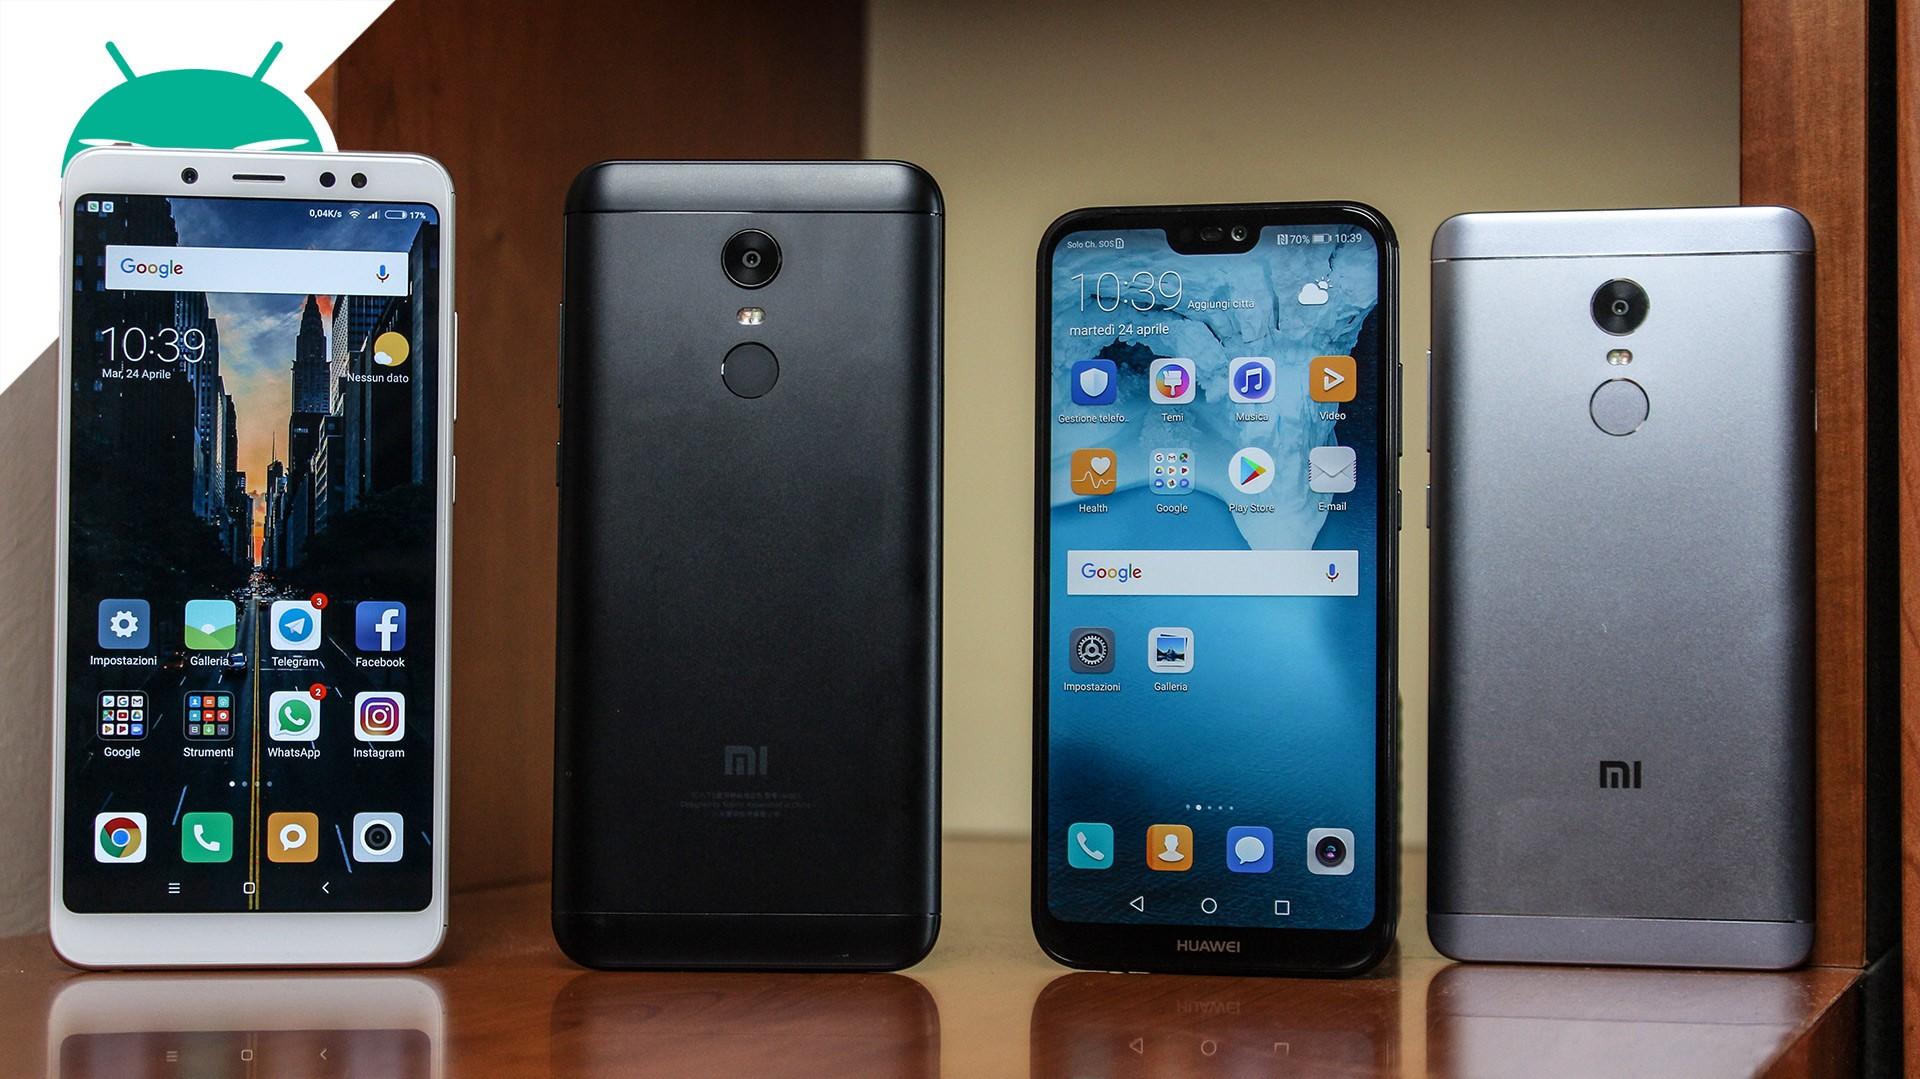 Skonfiguruj Xiaomi Redmi Note 4 VS Xiaomi Redmi Uwaga 5 VS Xiaomi Redmi 5 Plus VS Huawei P20 Lite